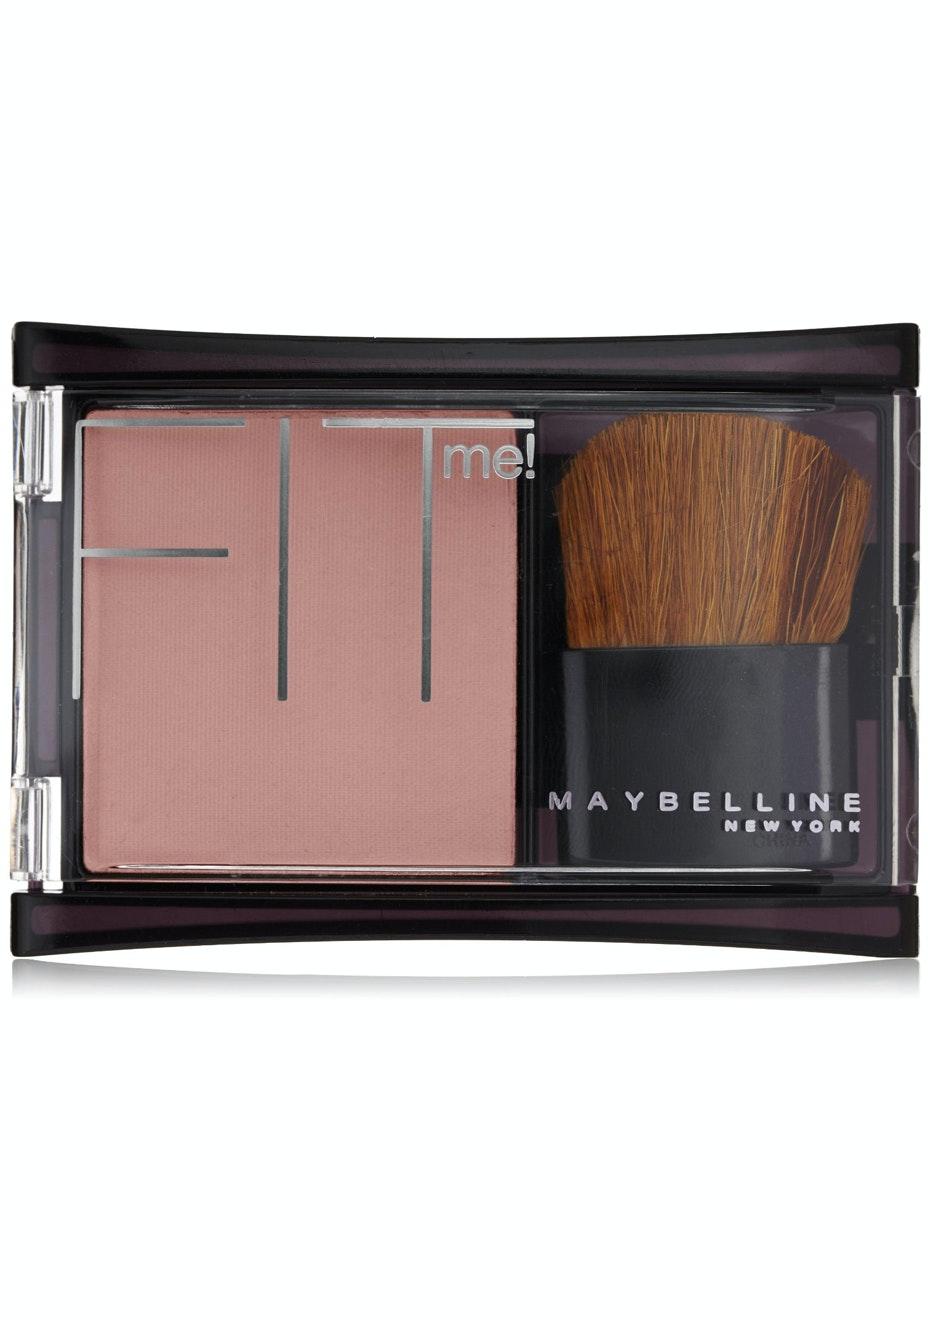 Maybelline Fit Me Blush Deep Mauve